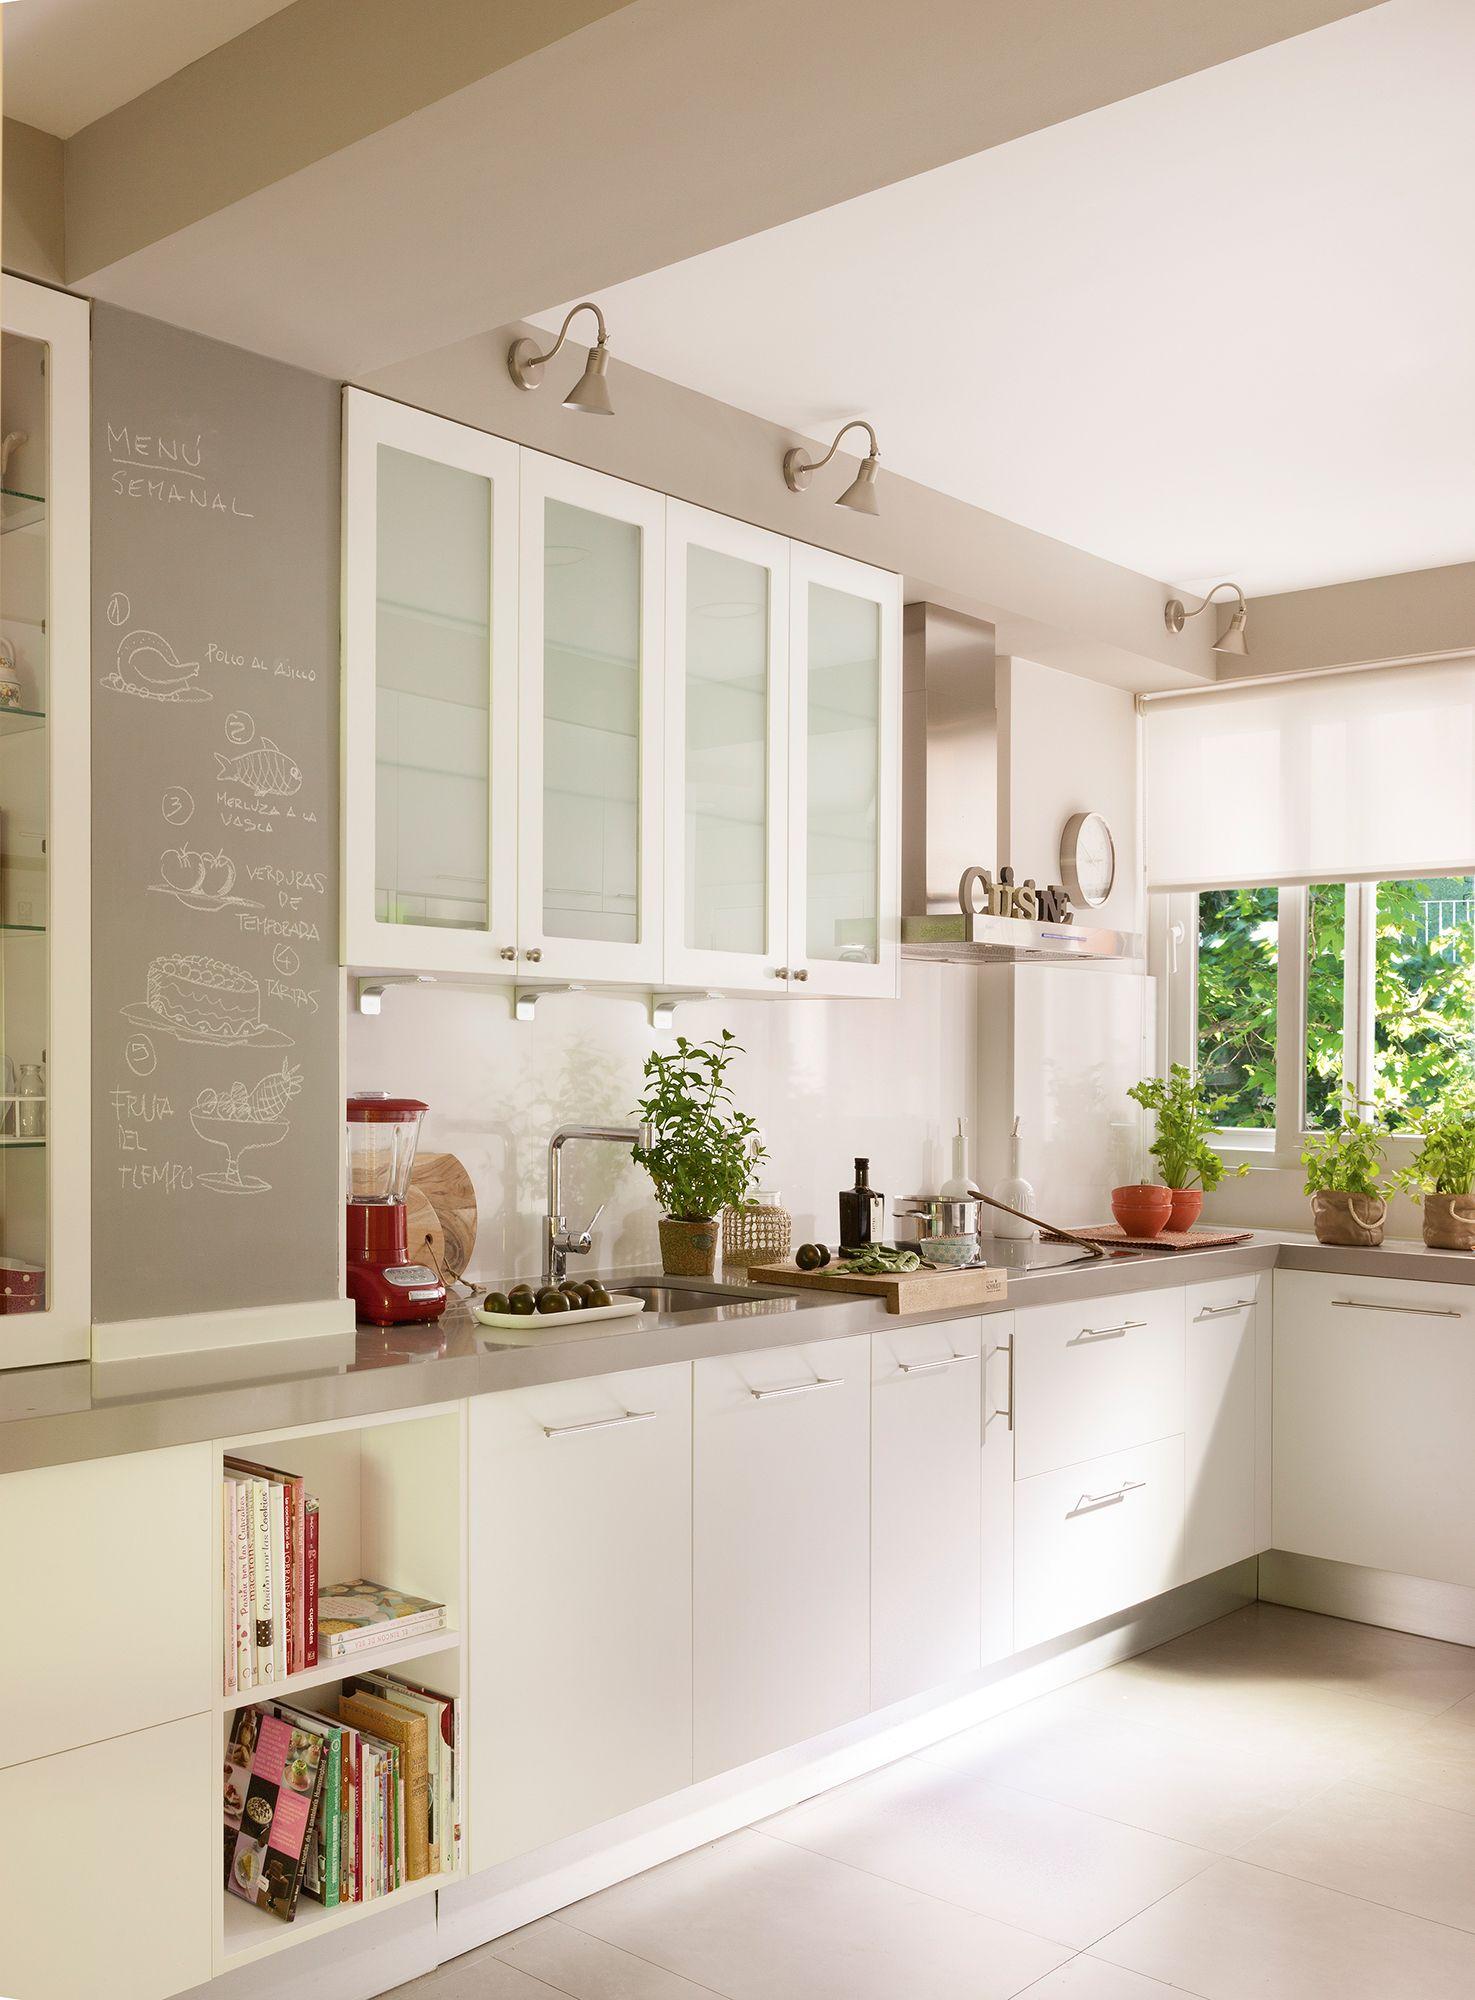 20 apliques para todo uso ideas para ganar luz - Apliques de cocina ...